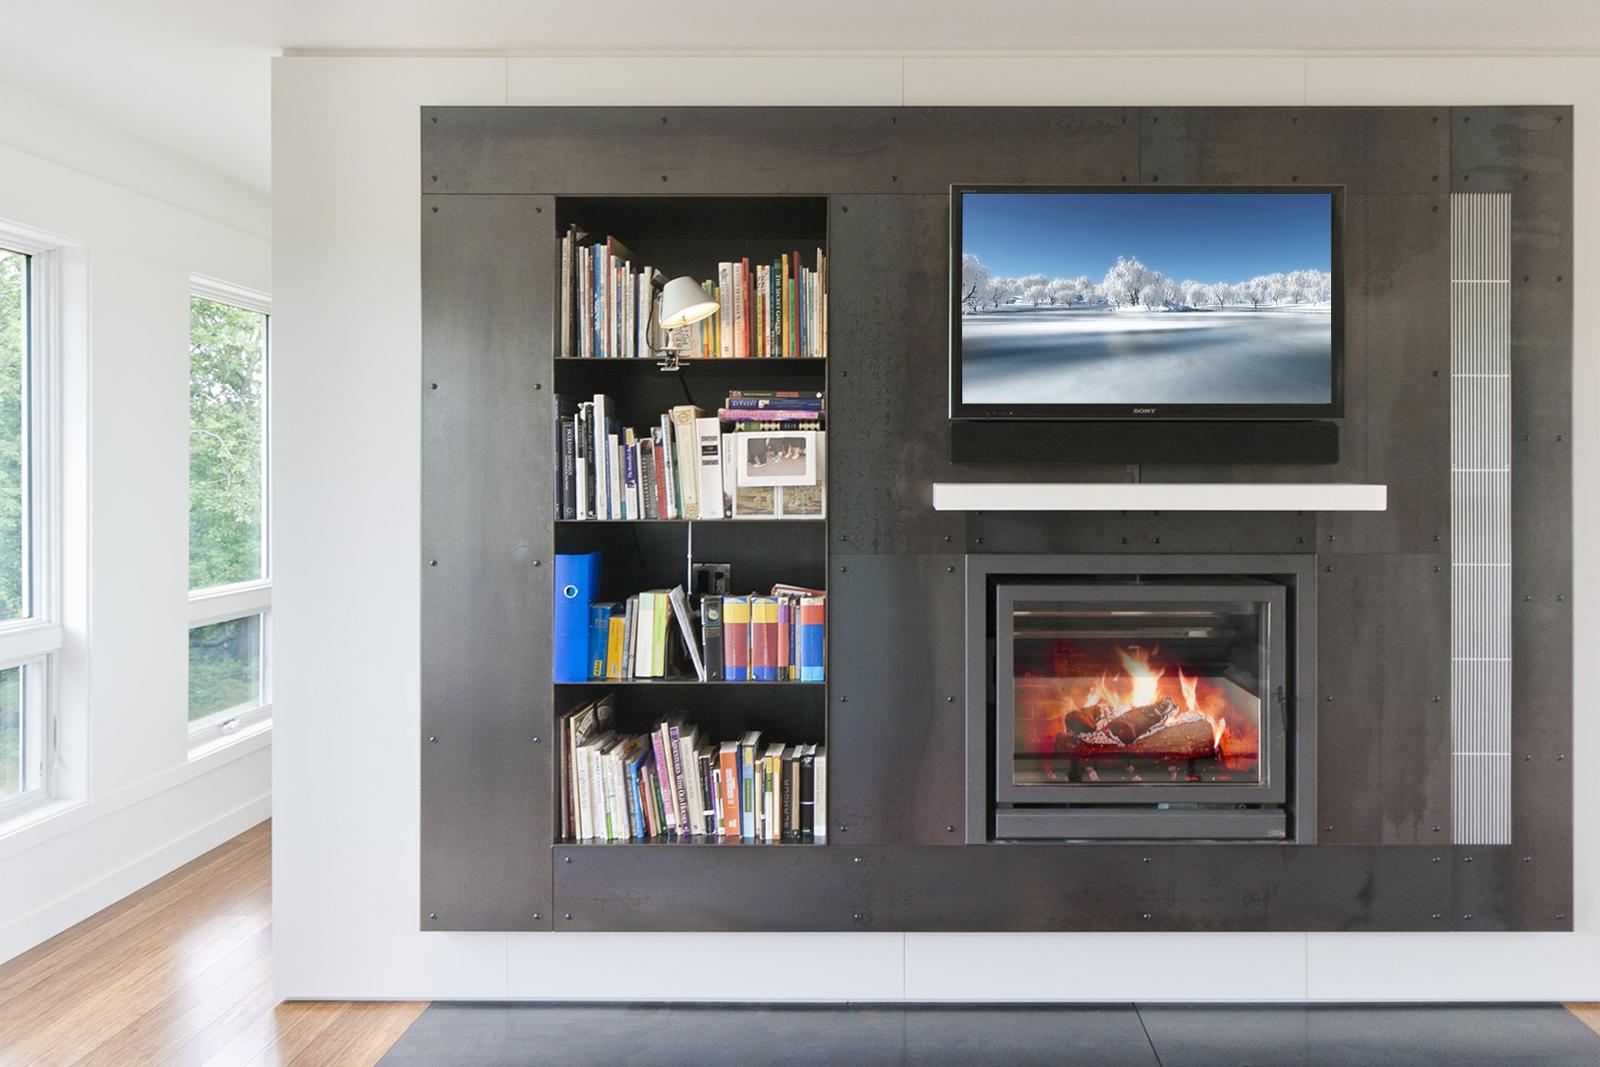 17-res4-resolution-4-architecture-modern-modular-home-prefab-house-fishers-island-interior-fireplace.jpg